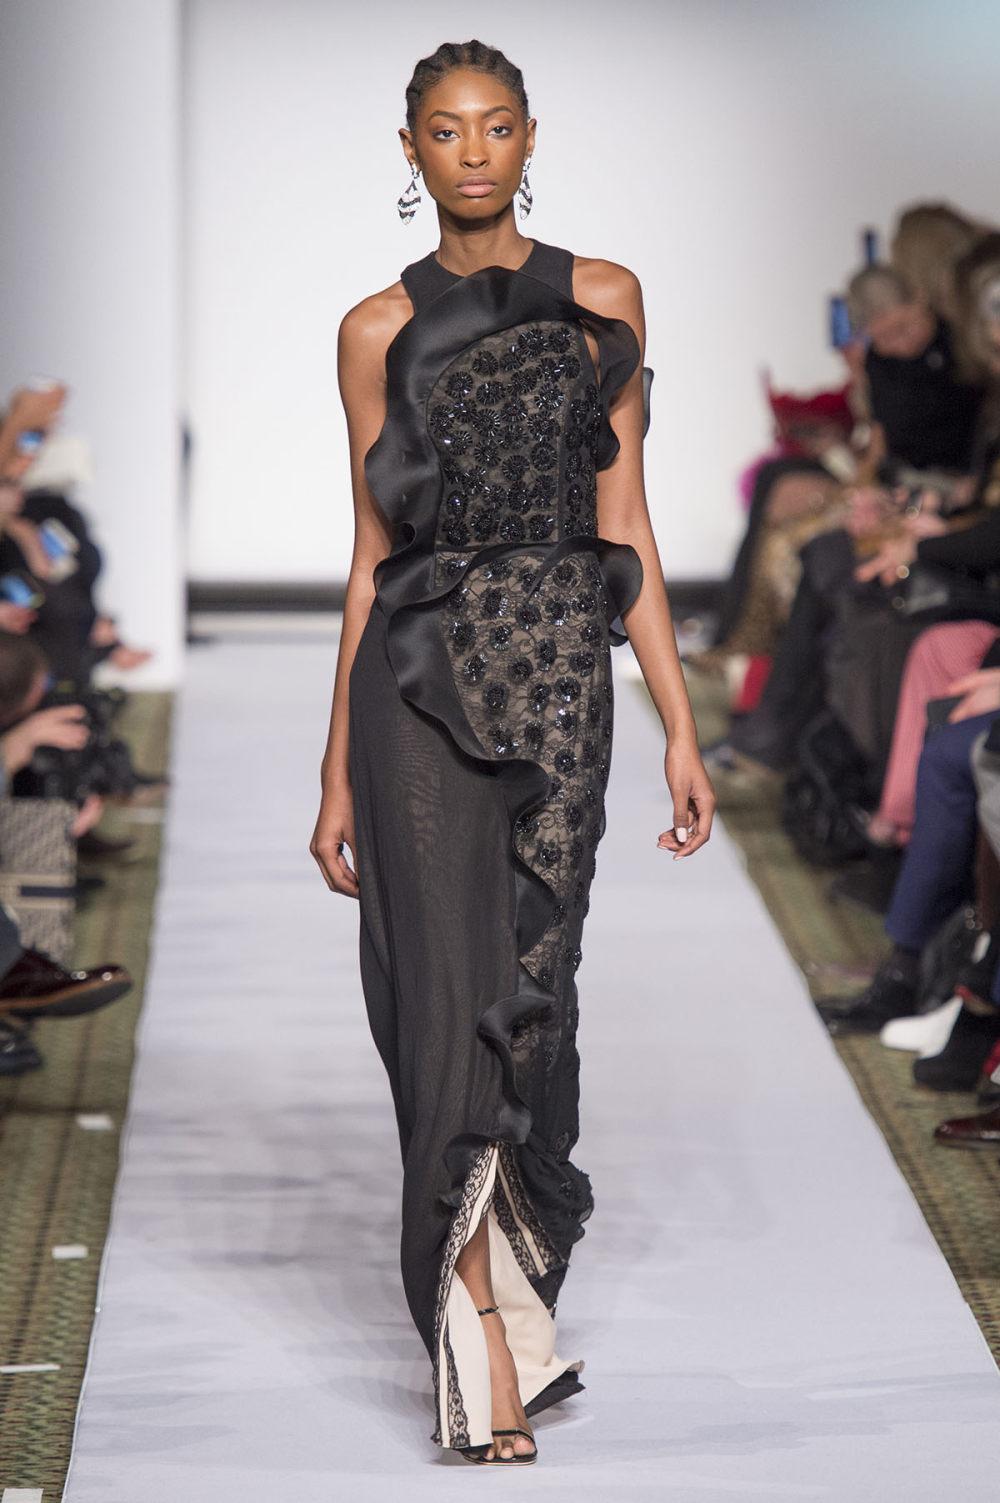 Carolina Herrera时装系列用鲜艳的颜色充满智能的黑白色调-14.jpg